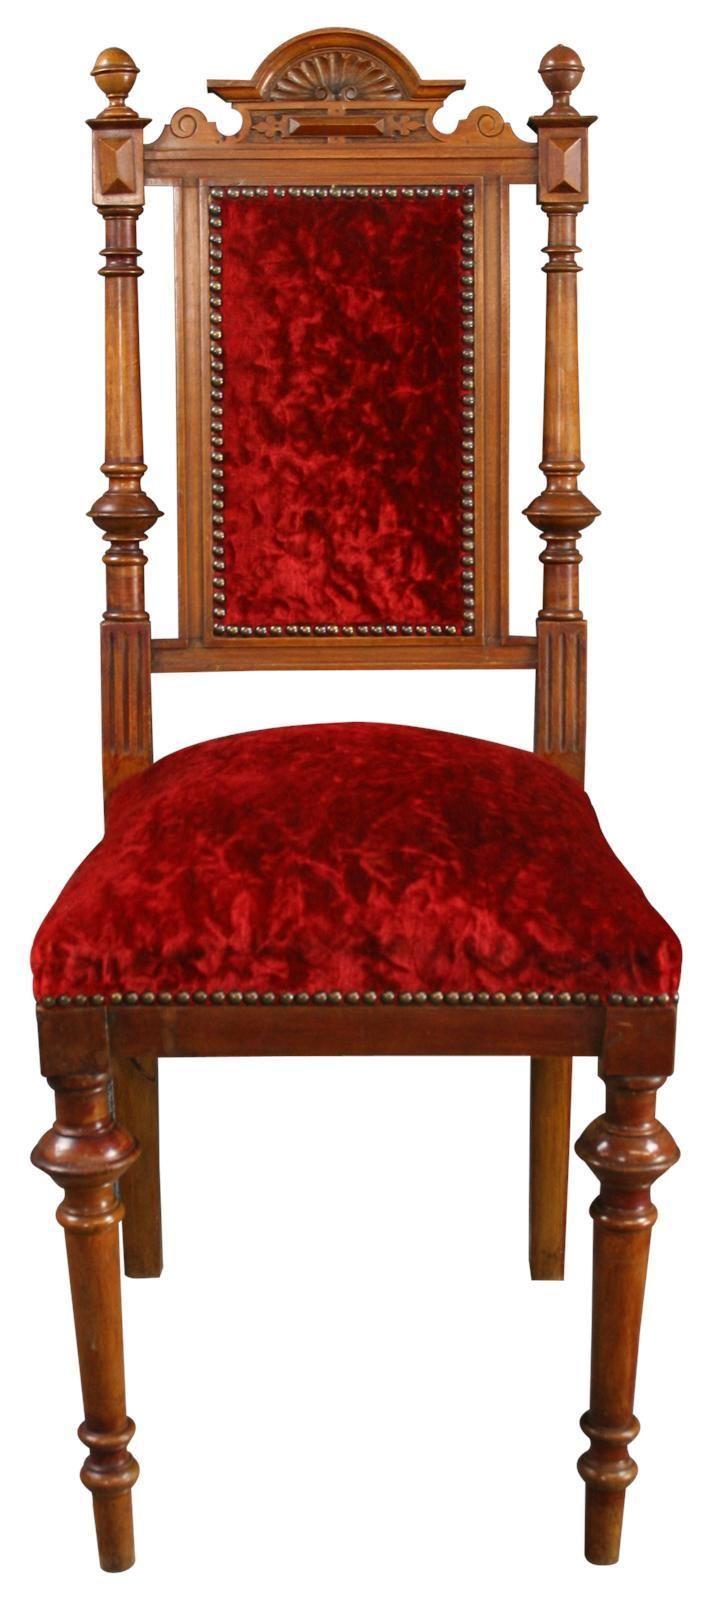 Antique velvet chair - 1900 Antique Dining Chair Renaissance Red Velvet Velour French Walnut Chairs Pinterest Antique Dining Chairs Dining Chairs And Renaissance